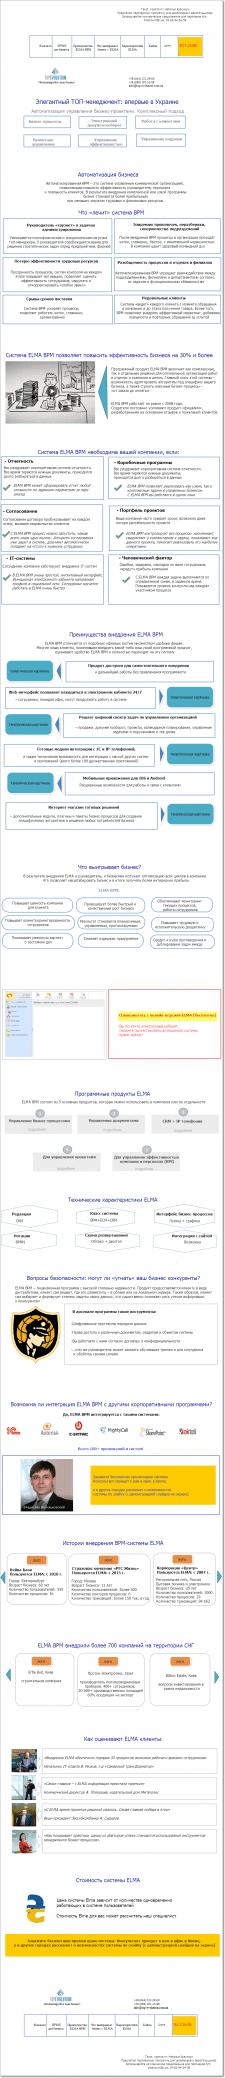 Лендинг: текст + прототип для BPM Елма